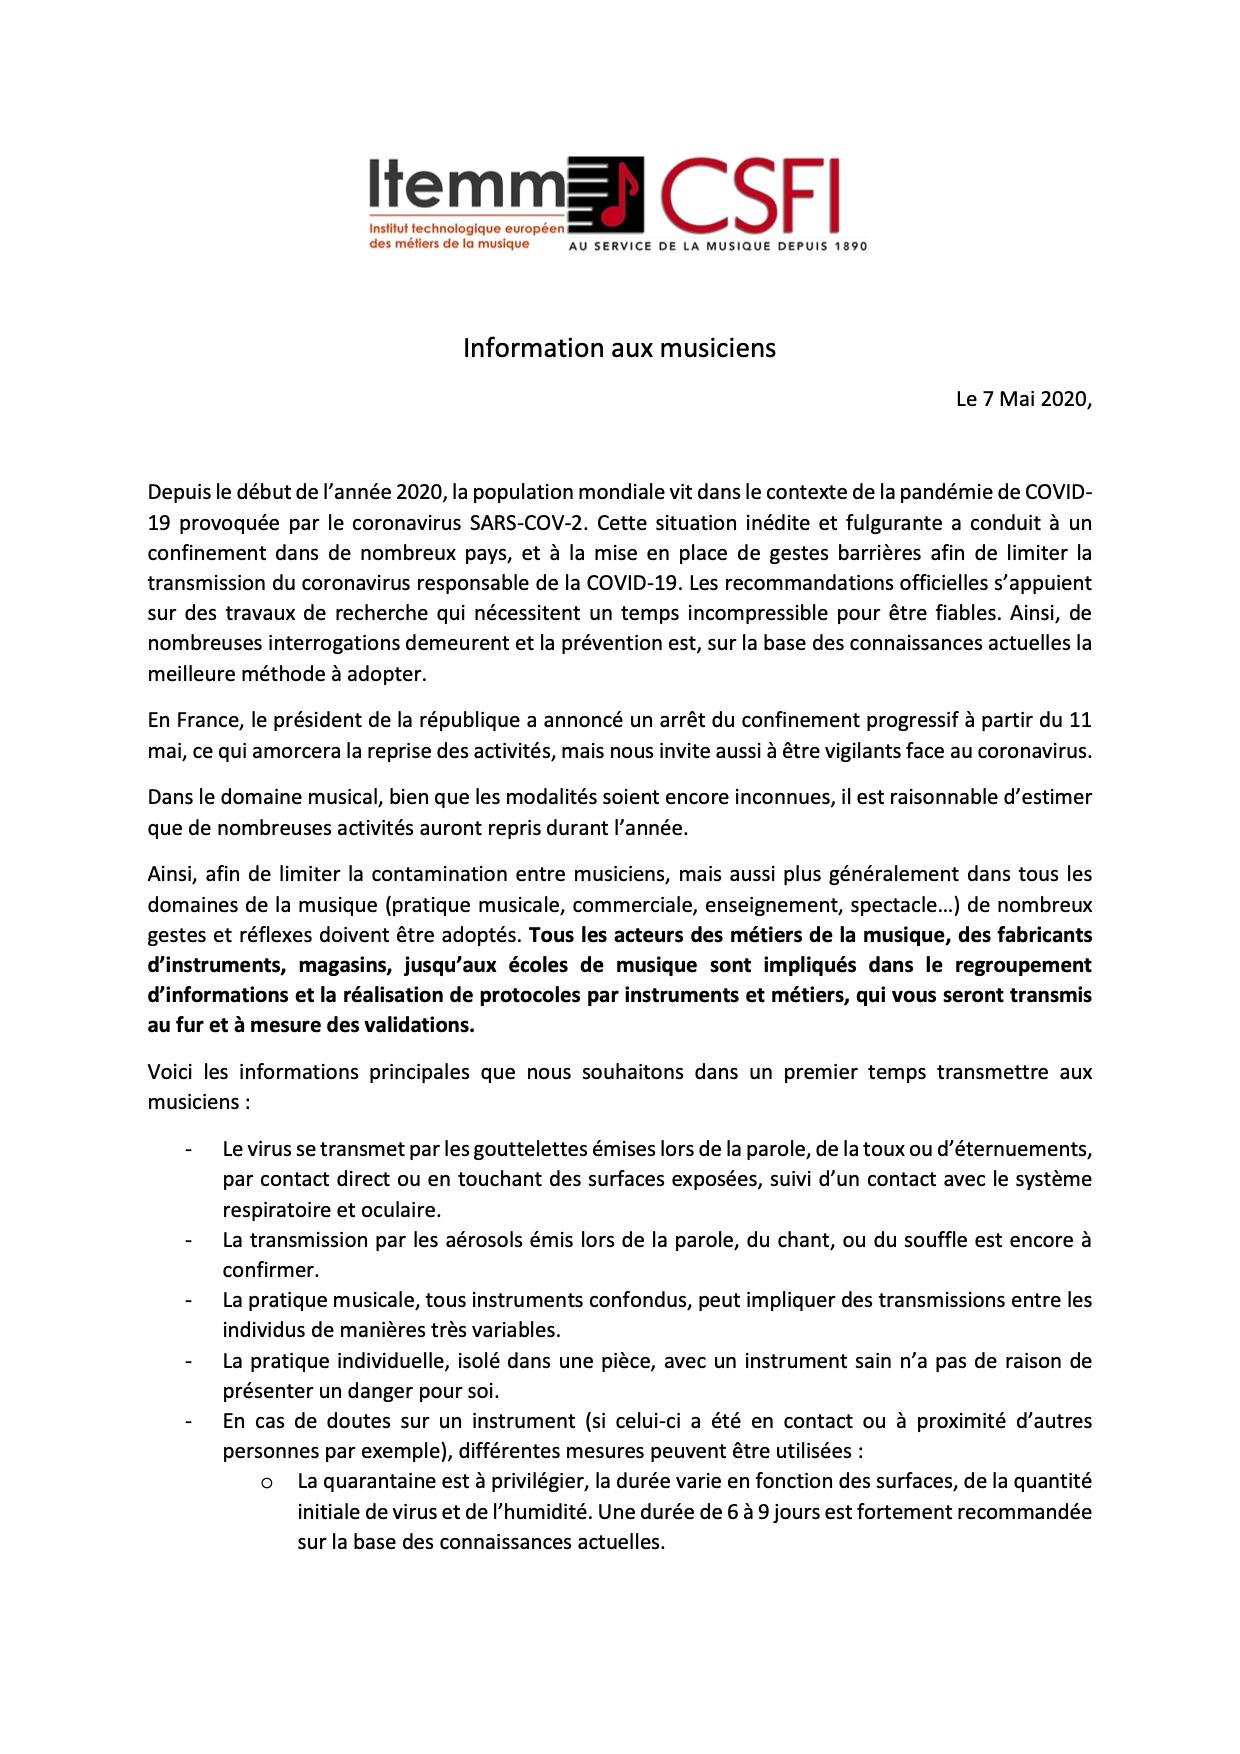 Lettre ITEMM/CSFI page 1